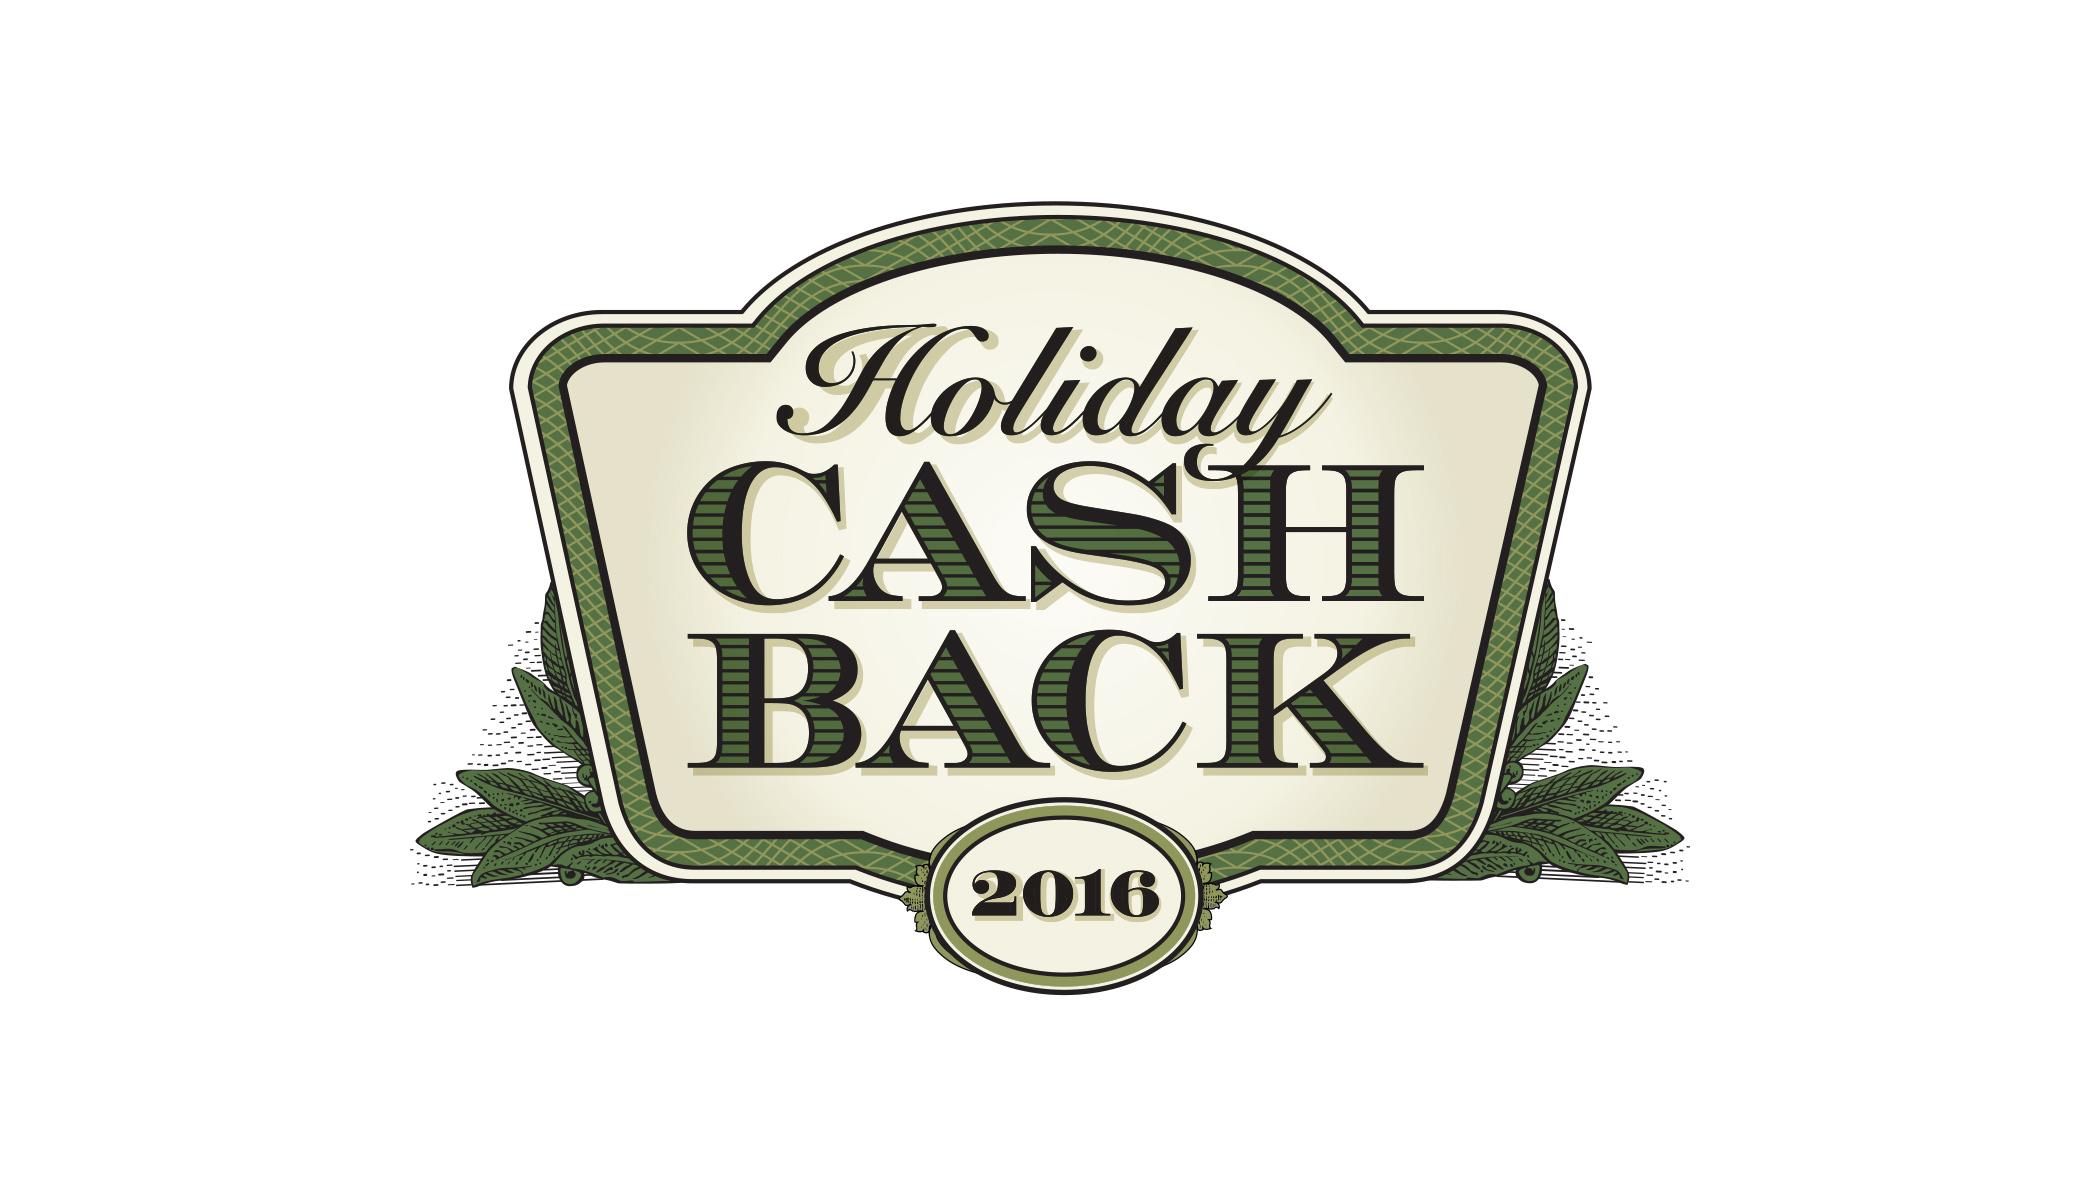 Holiday Cash Back